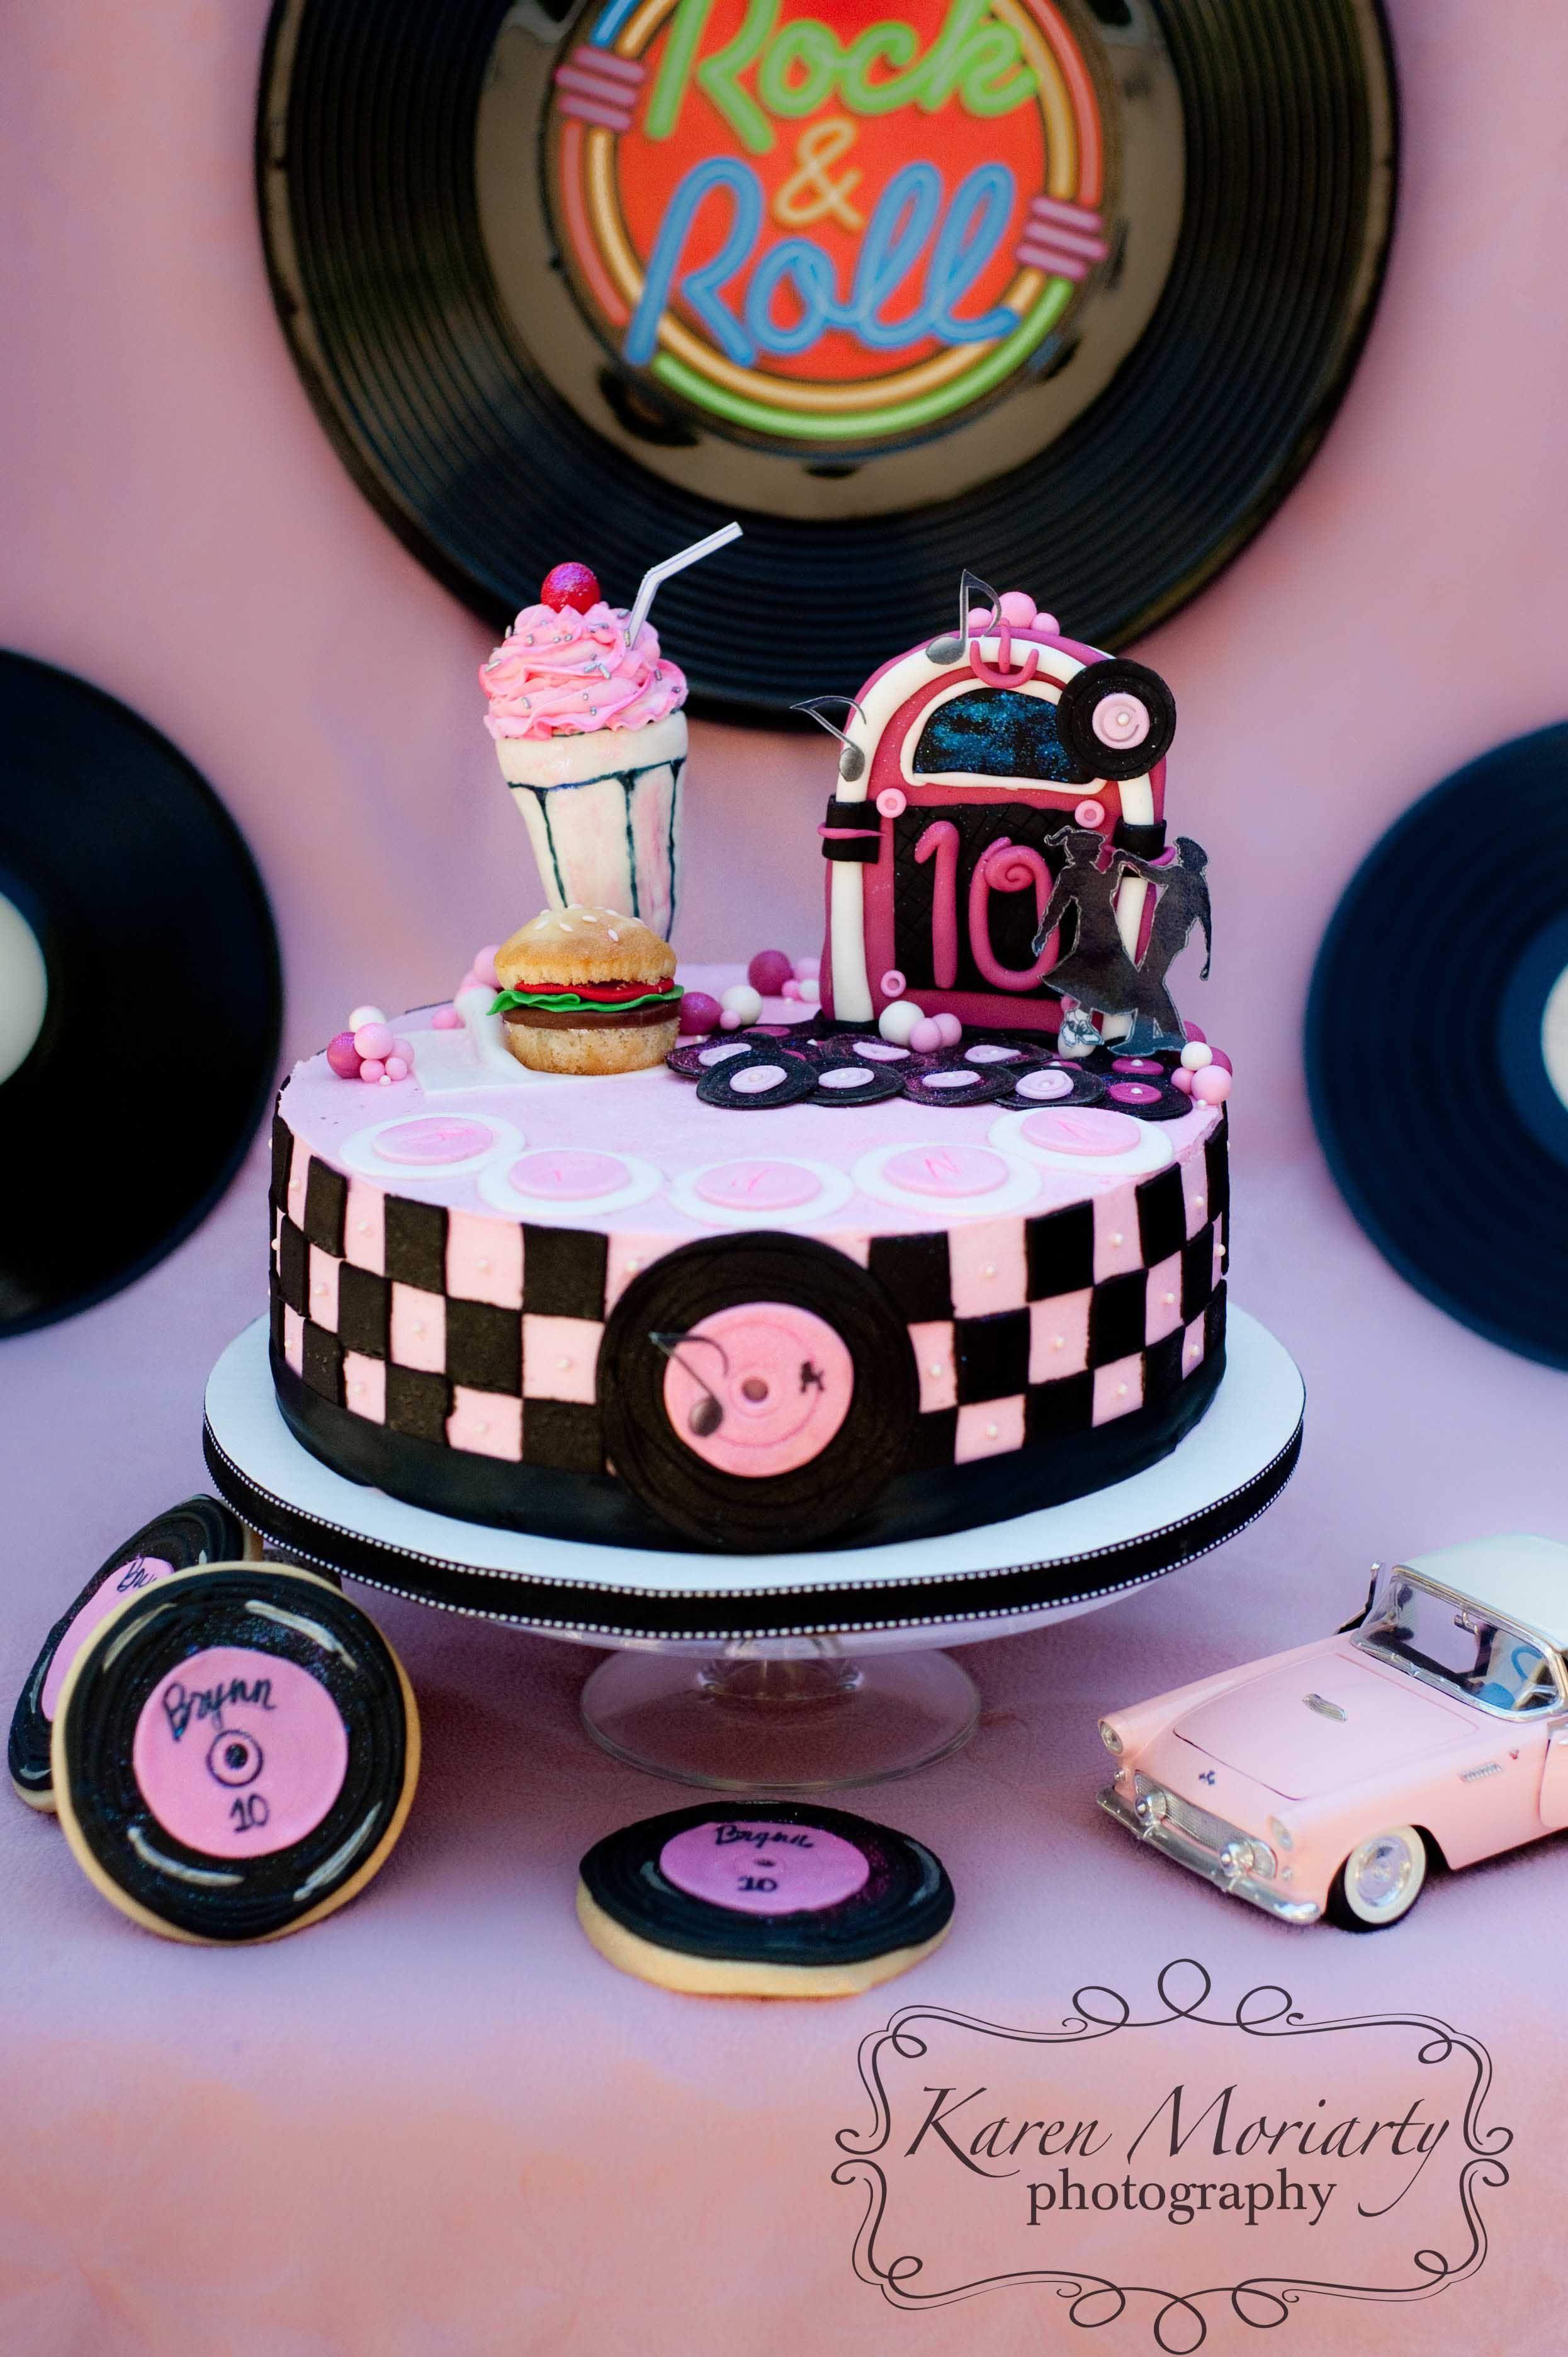 50 S Theme Cake Cookies Themed Cakes 80 Birthday Cake 50s Cake